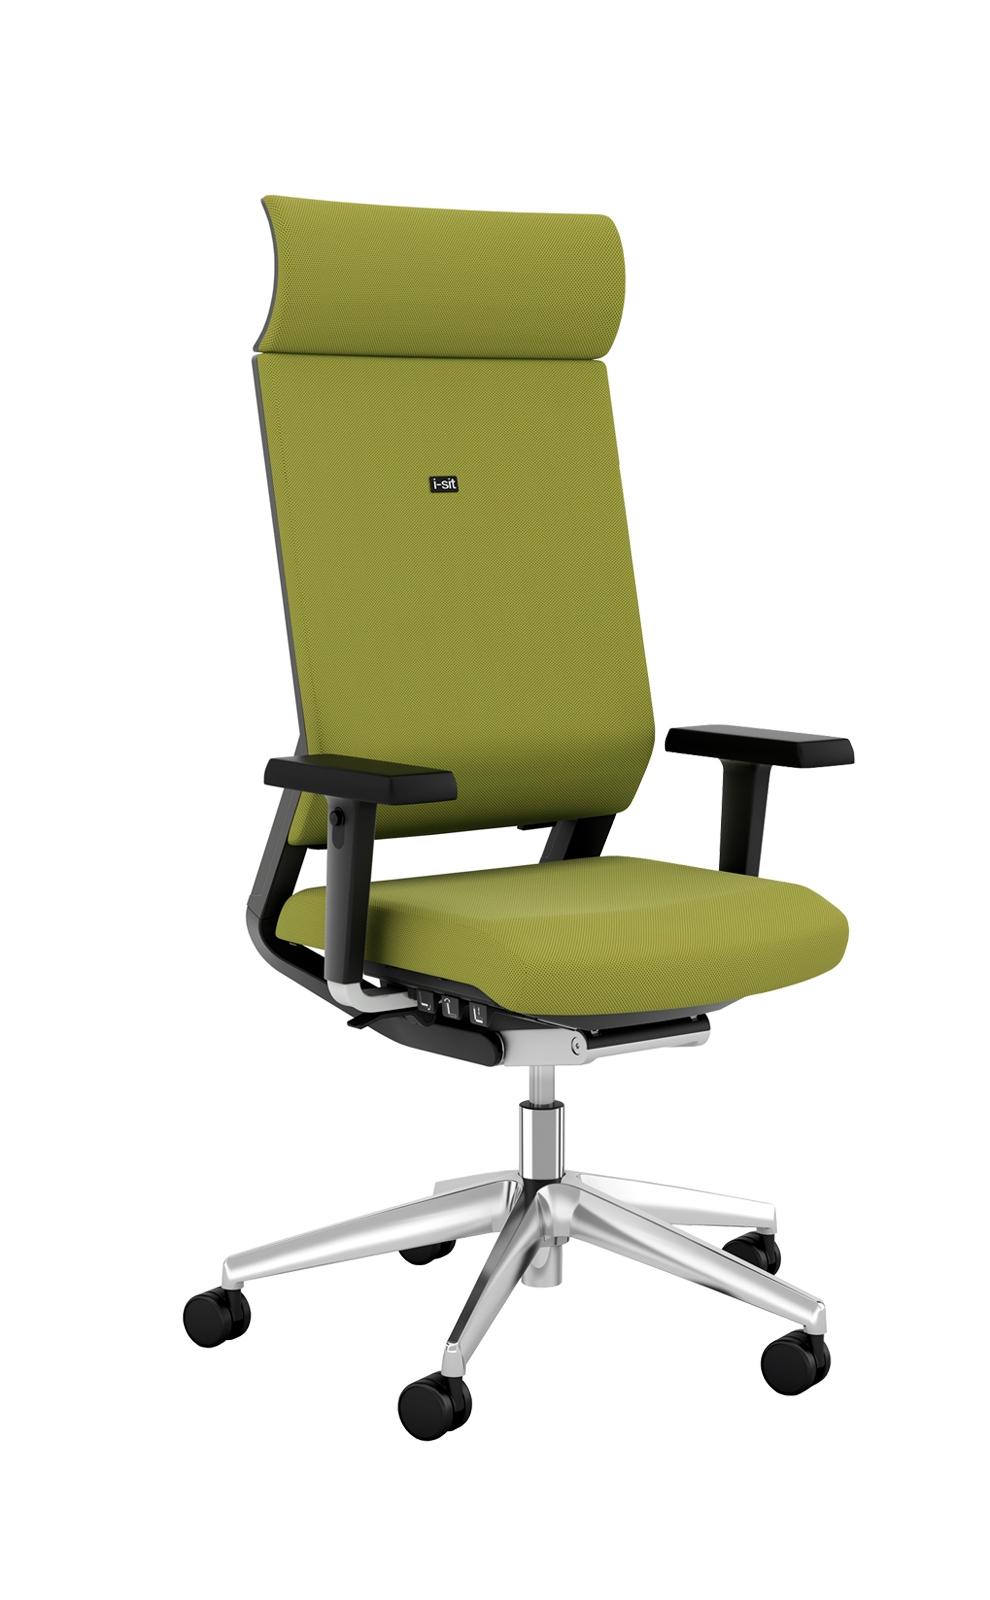 Custom task chair